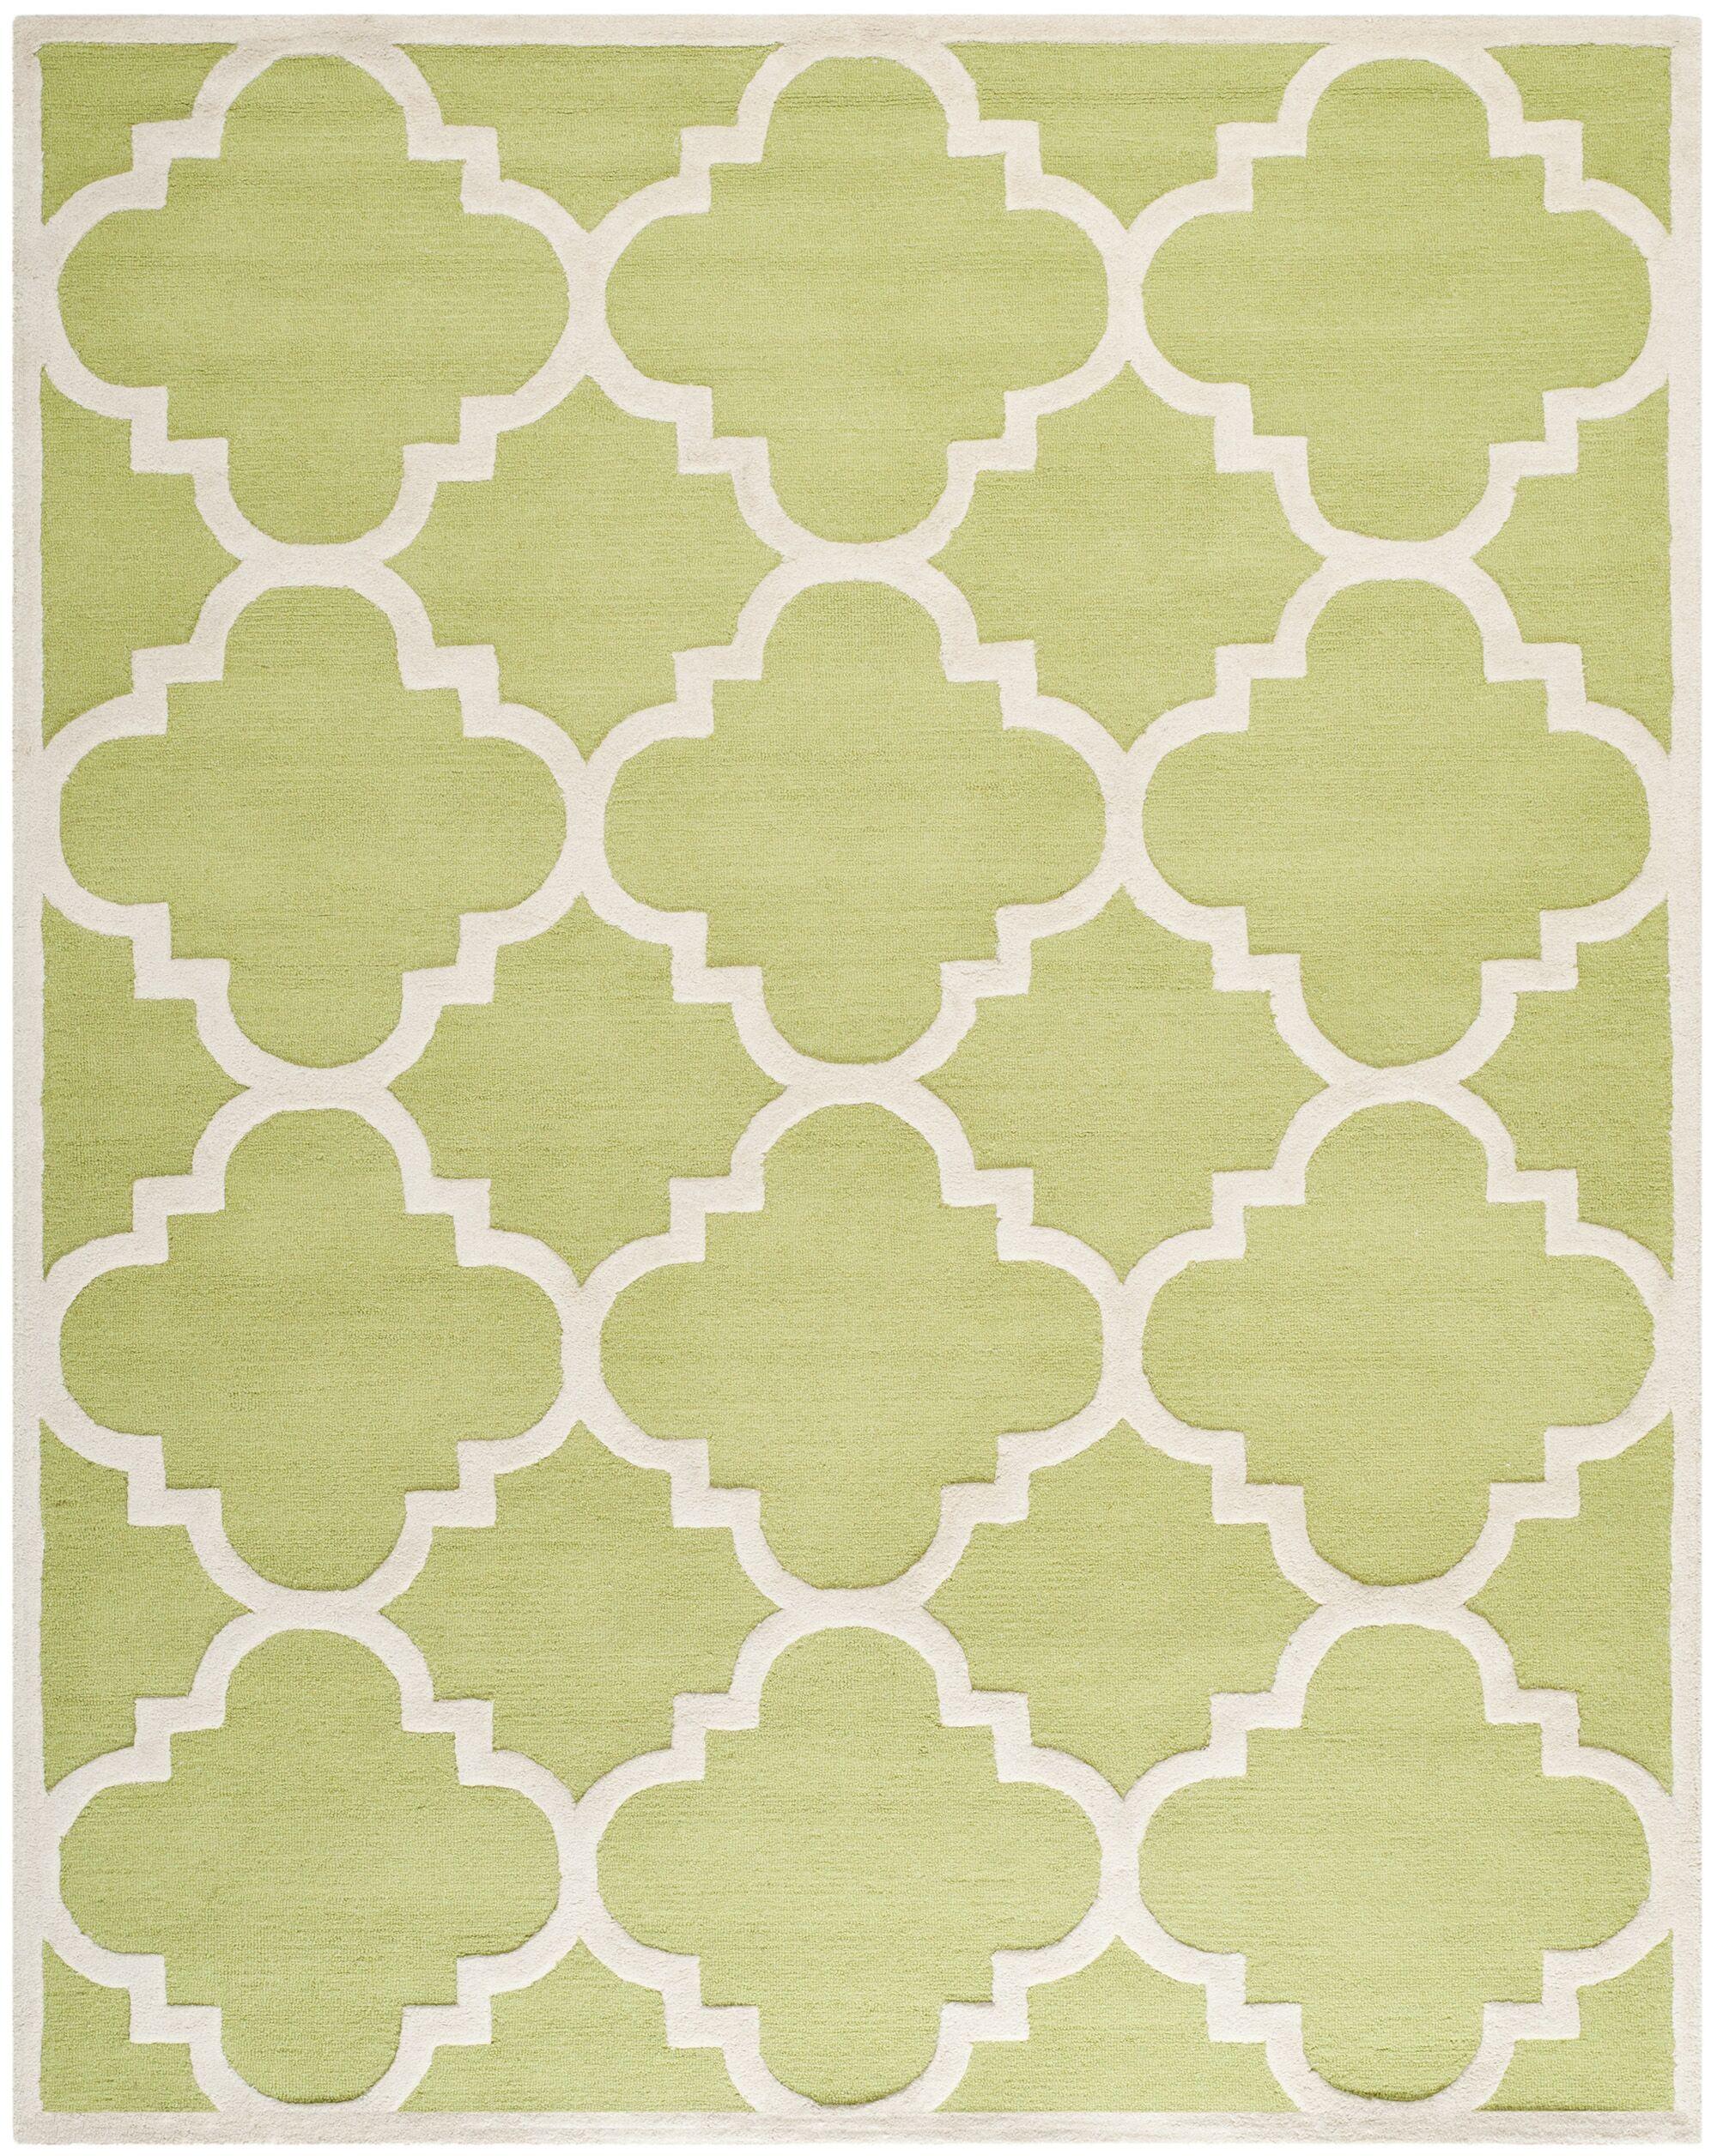 Charlenne Wool Green / Ivory Area Rug Rug Size: Rectangle 8' x 10'